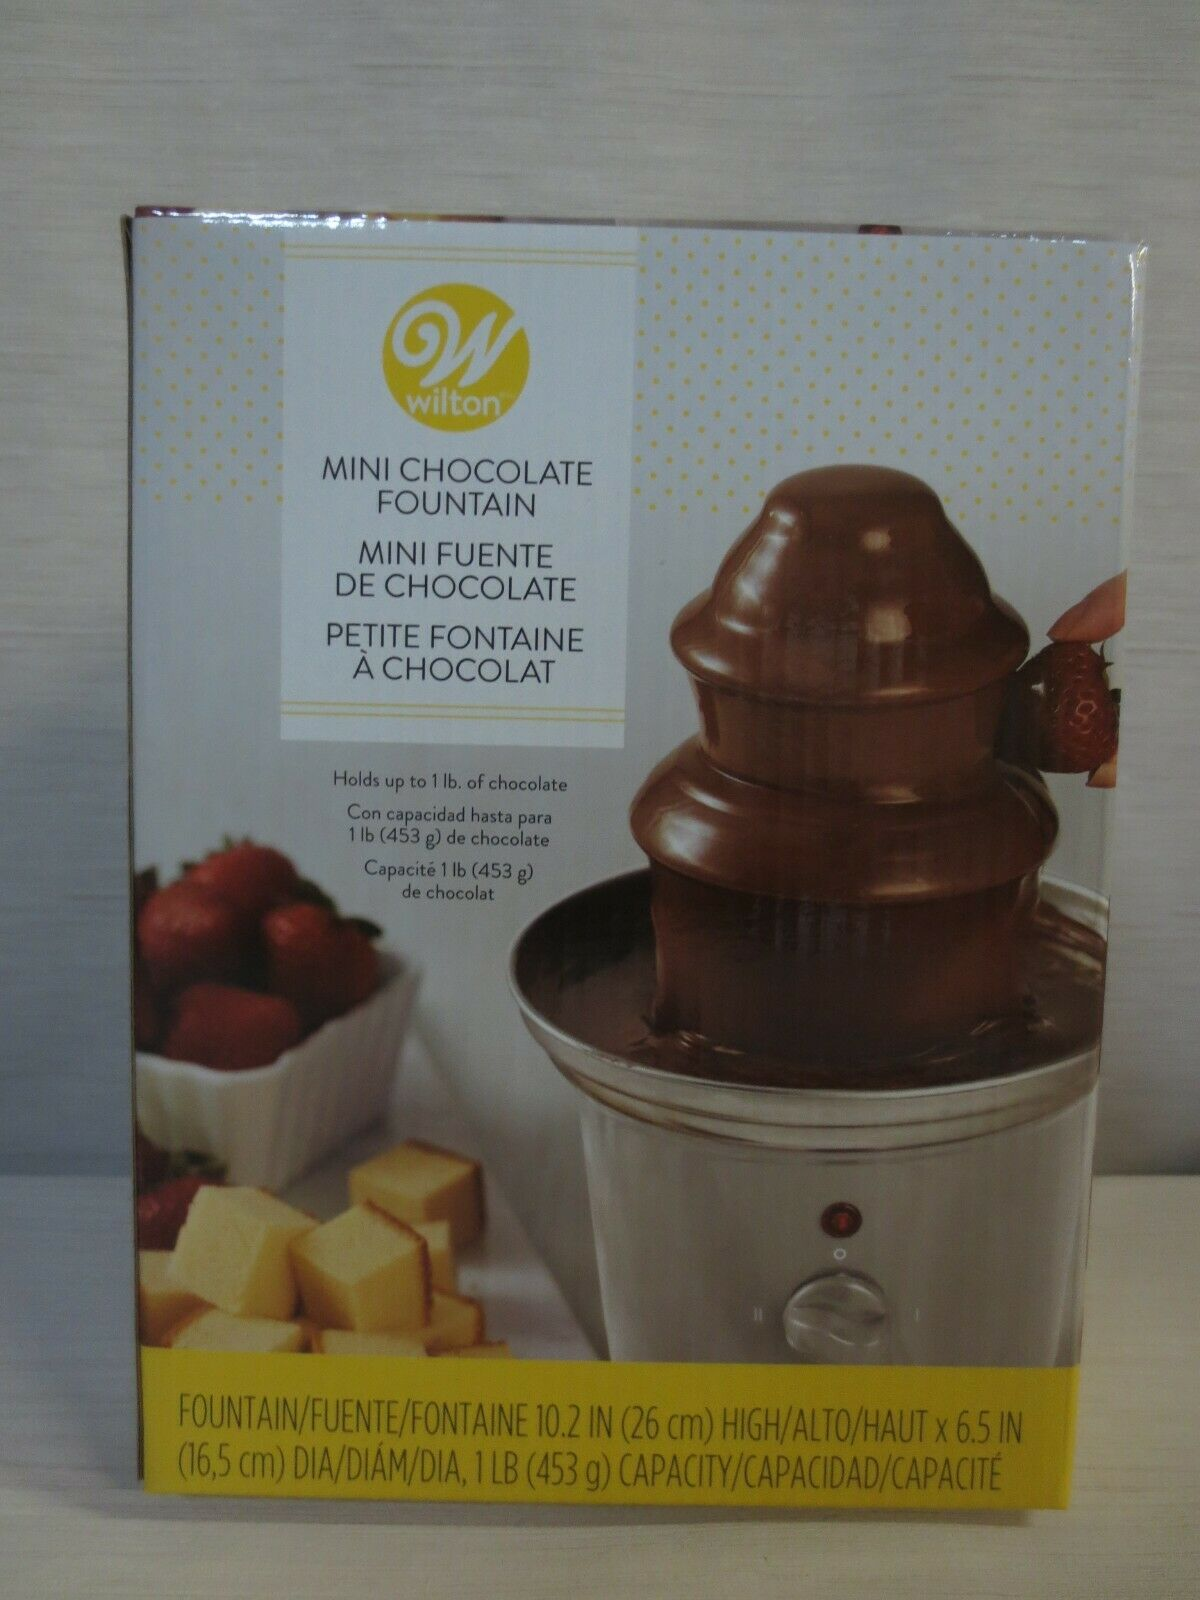 Wilton Mini Chocolate Fountain - Chocolate Fondue Fountain